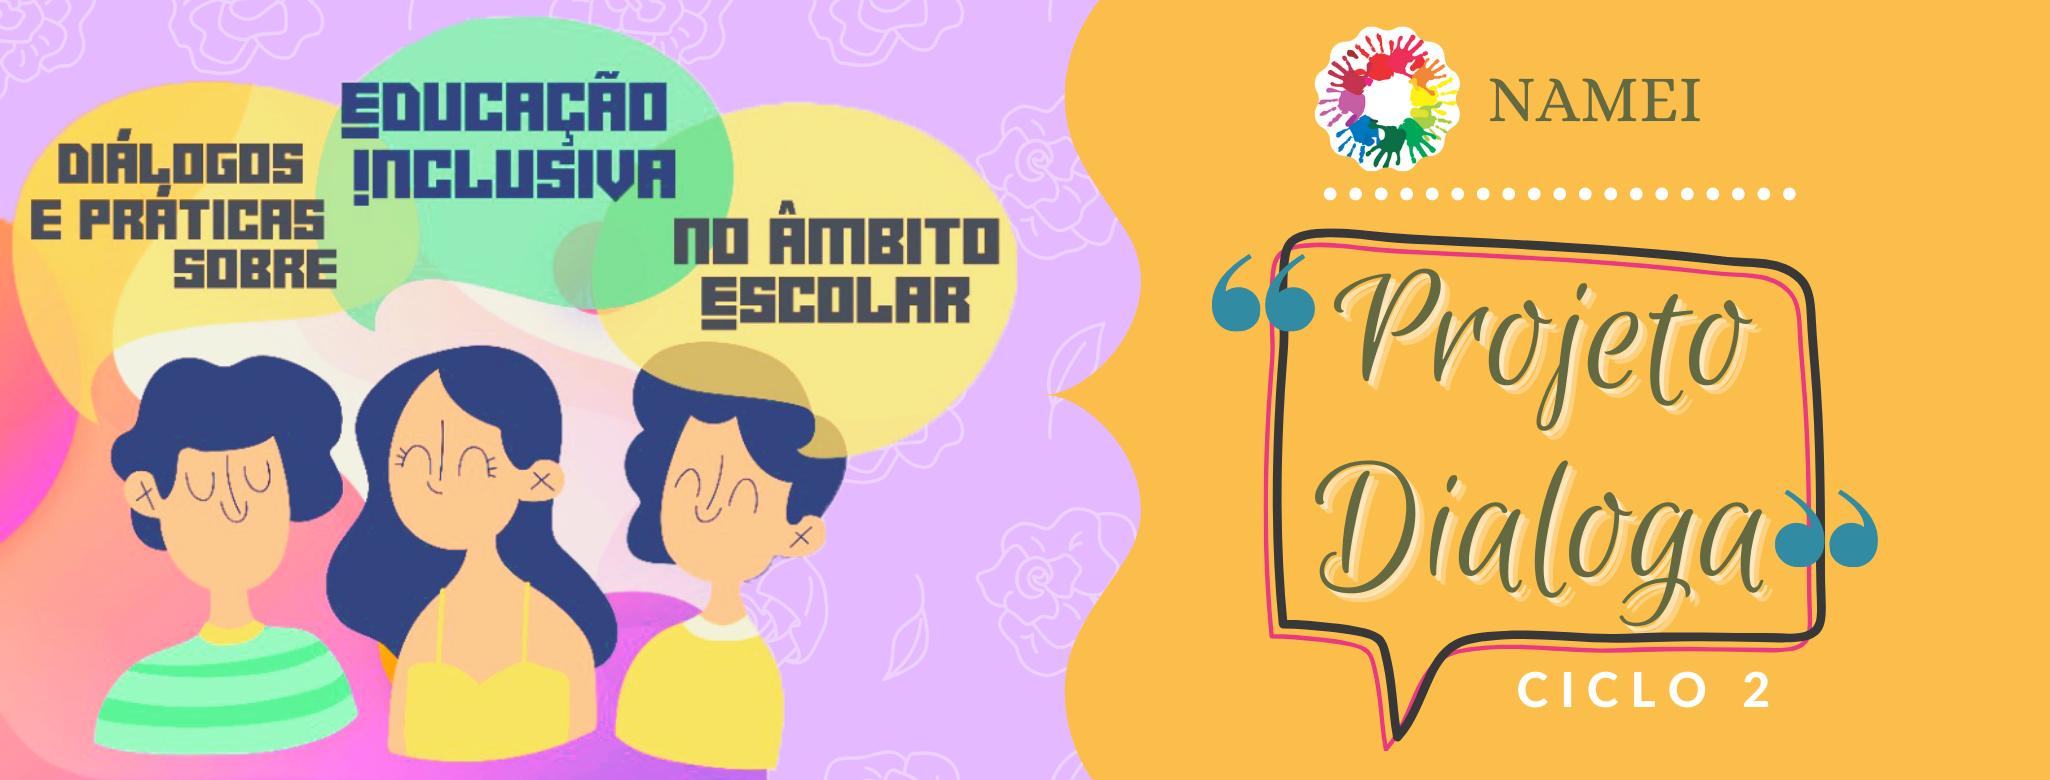 Projeto Dialoga- Ciclo 2